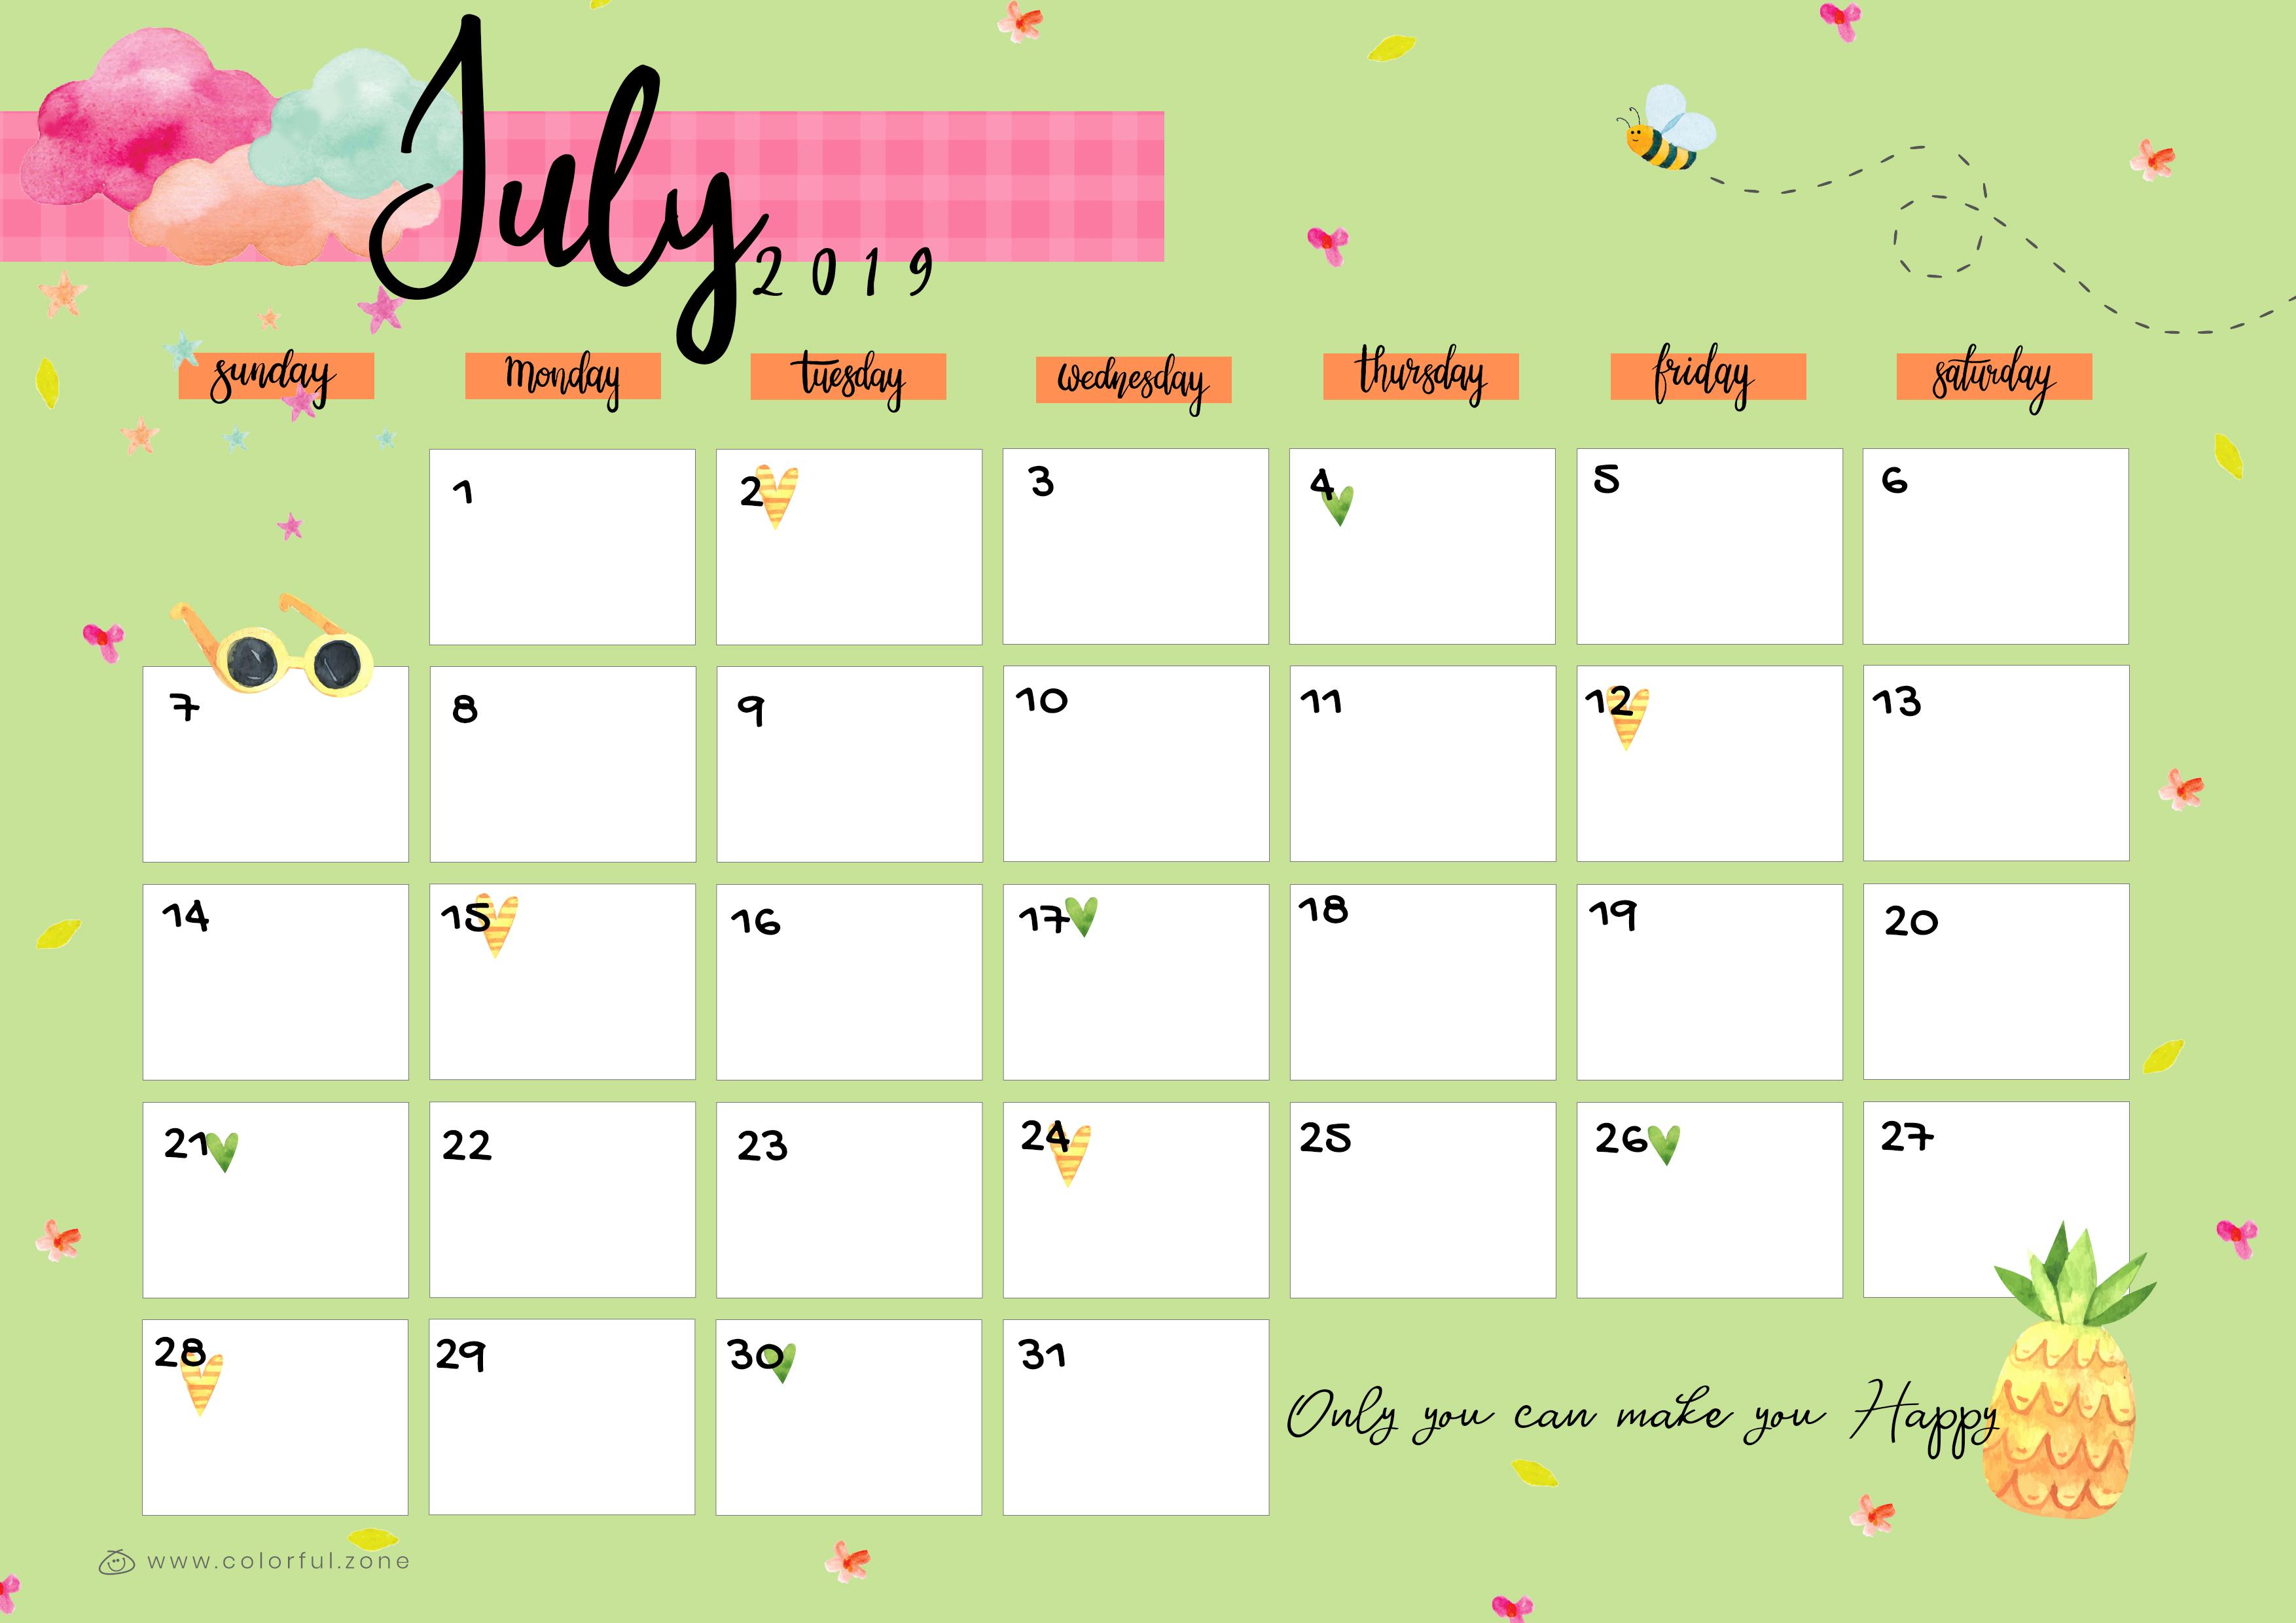 July Printable Colorful Calendar 2019